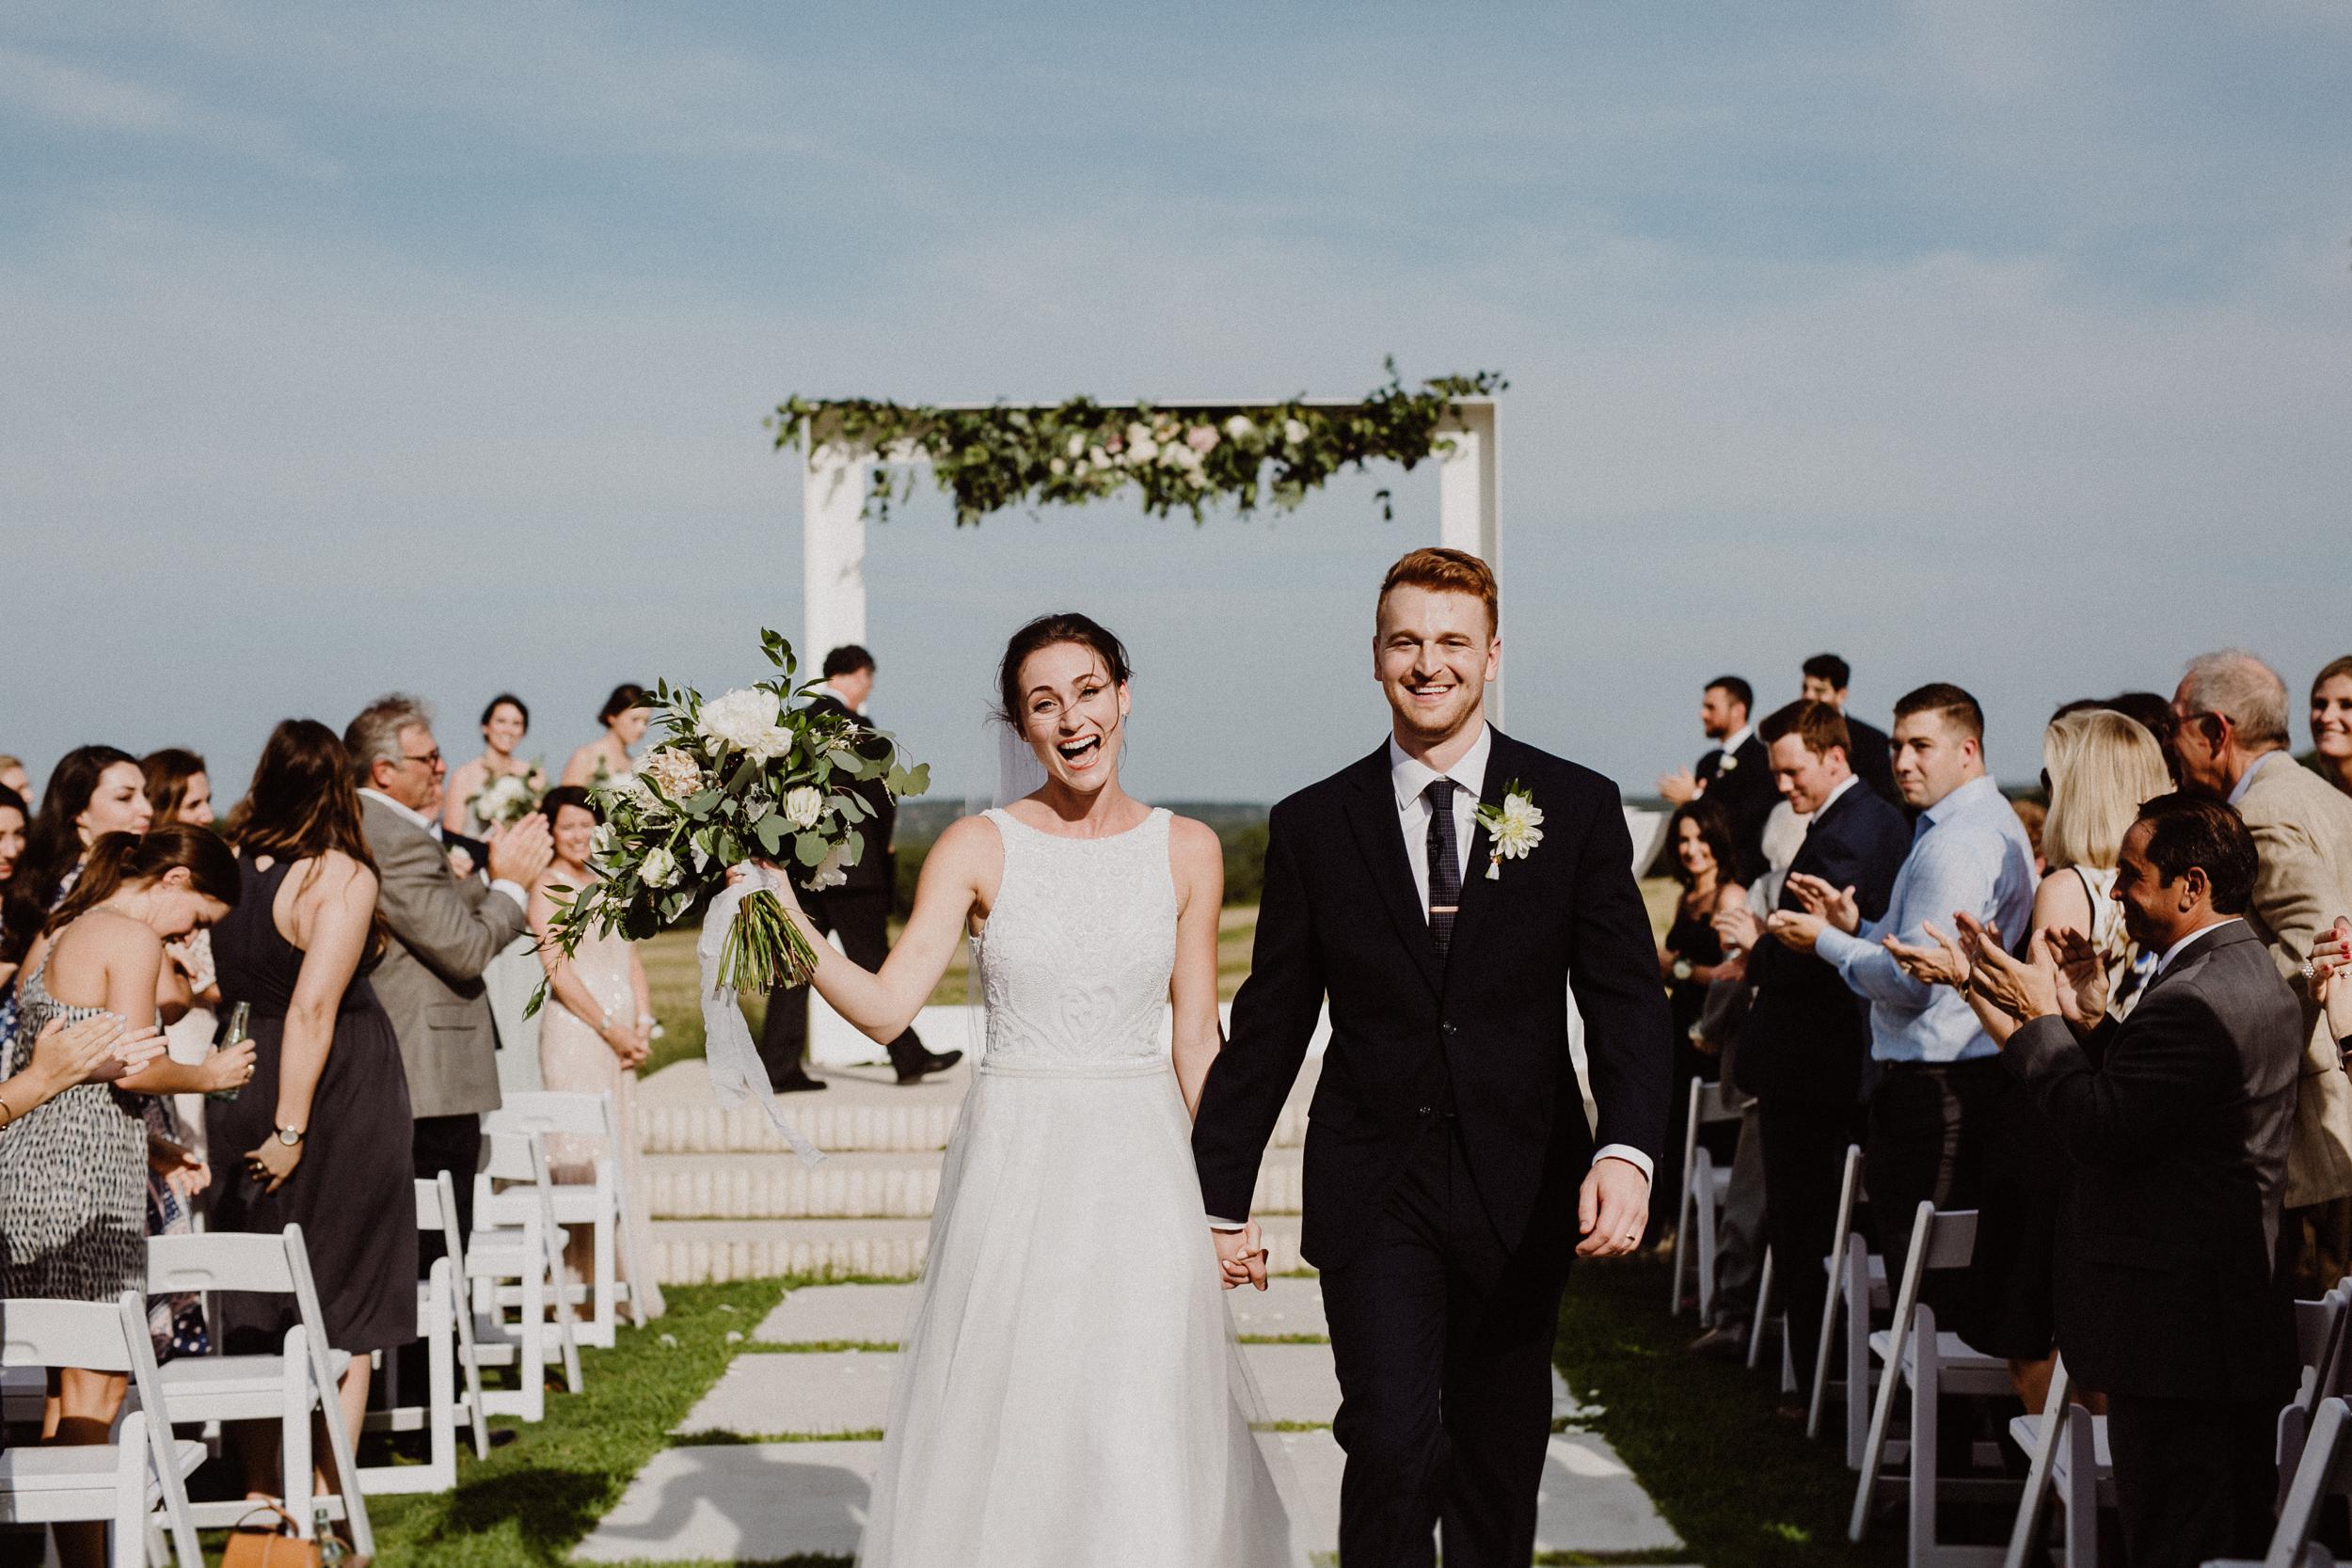 prospect-house-wedding-S&AC-618.jpg